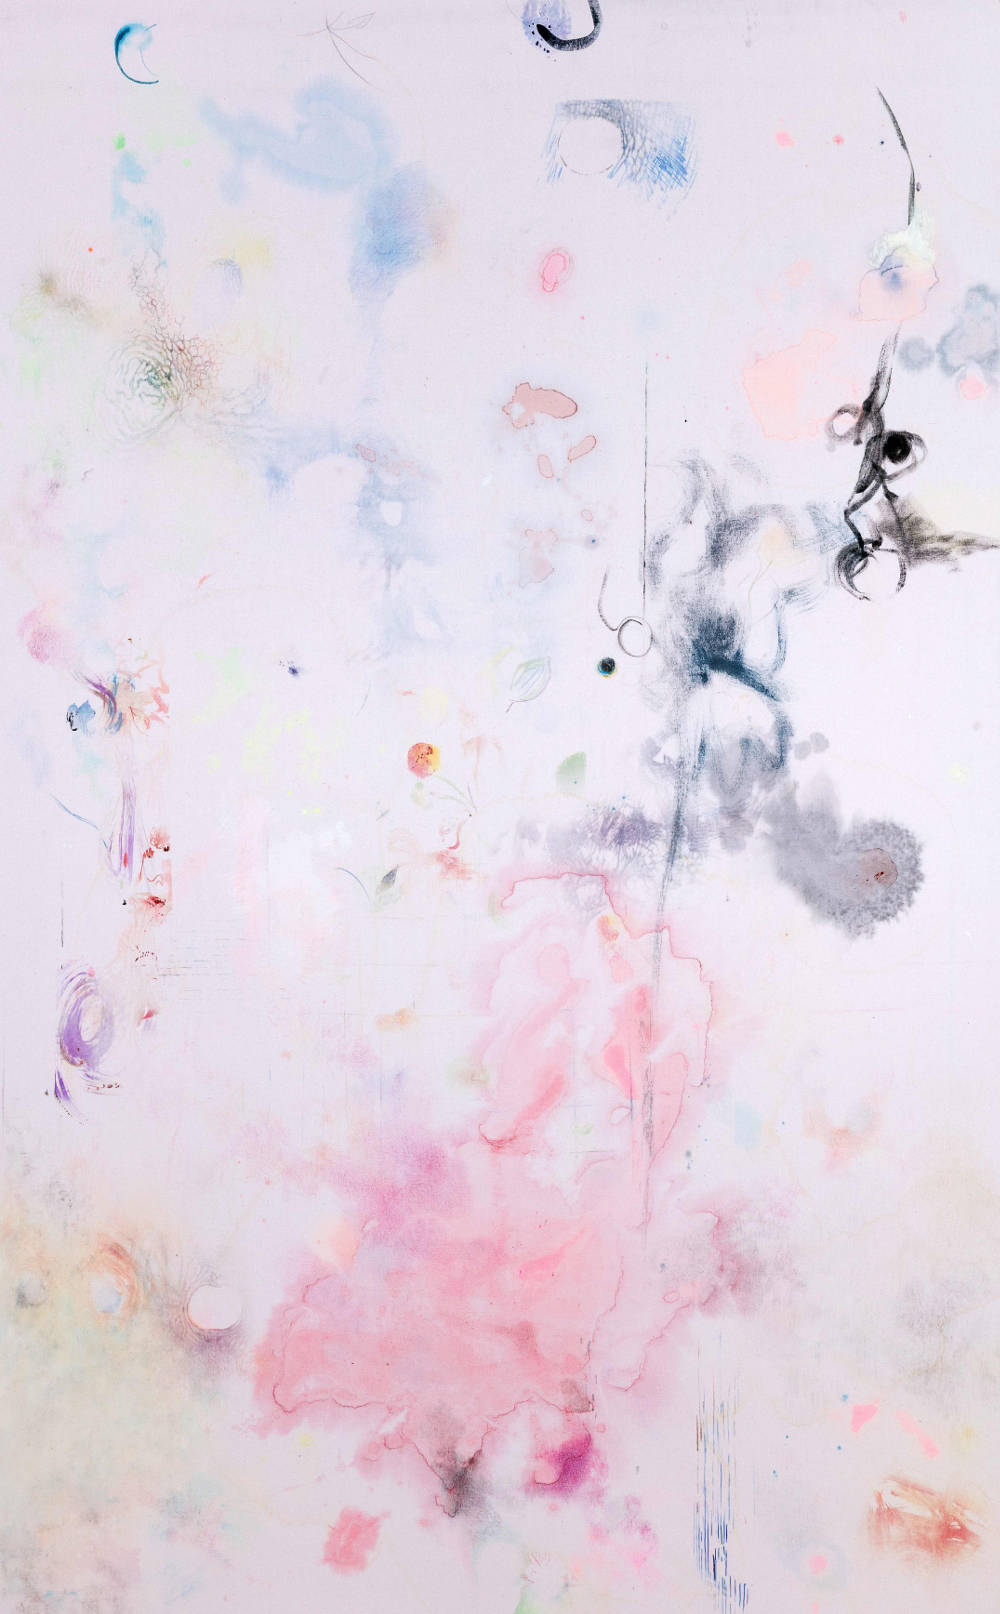 Anna Klimentchenko, Untitled 2, 2016, mixed water-based media on fabric, 240x150cm